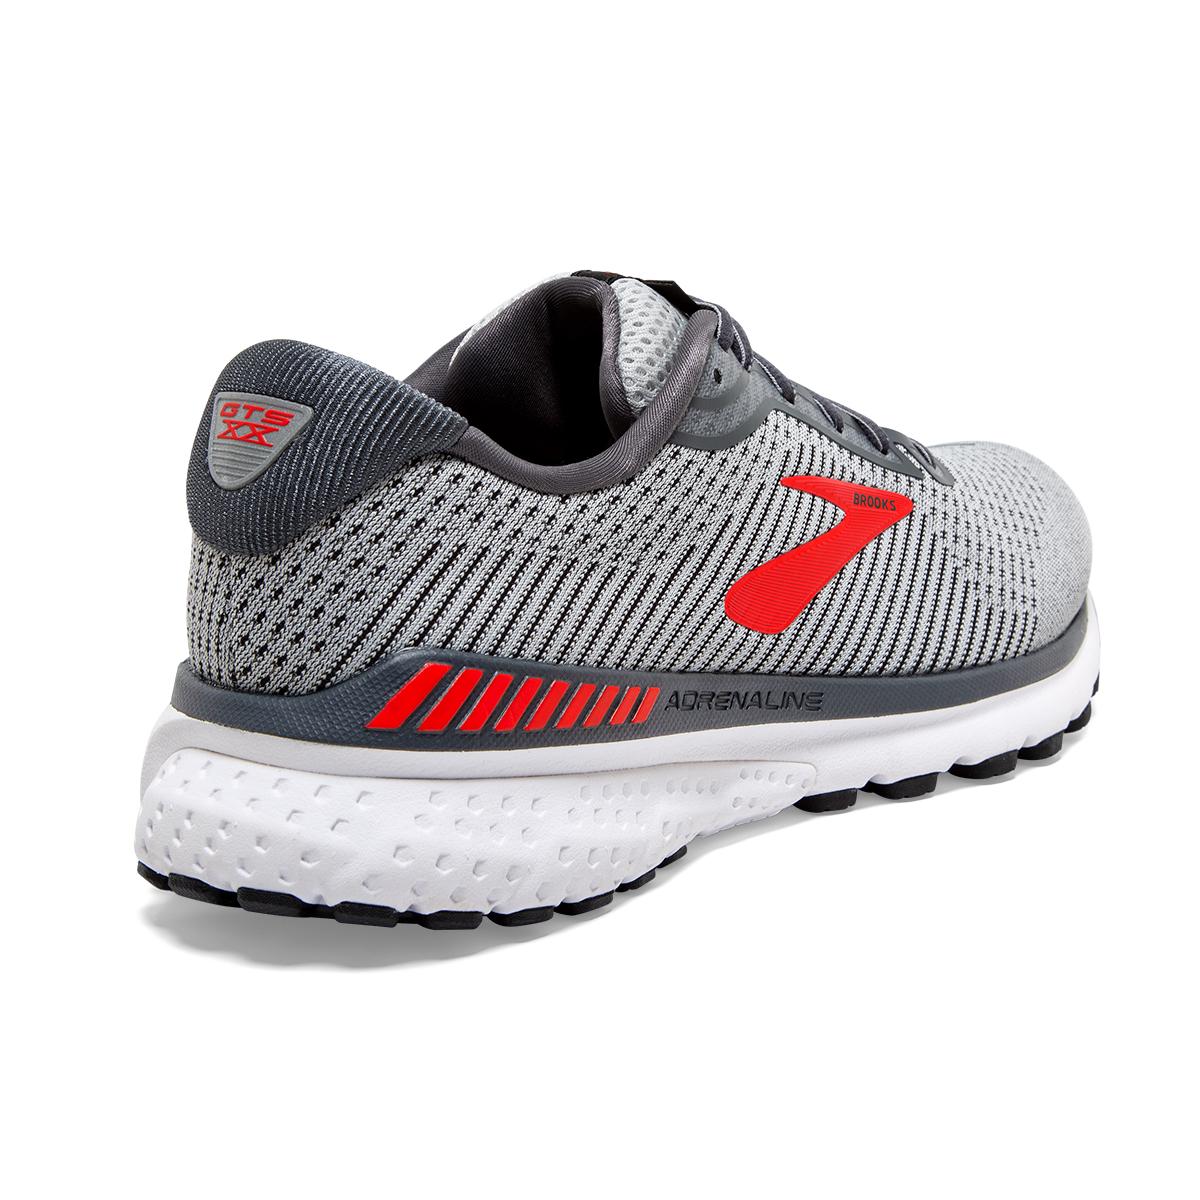 Men's Brooks Adrenaline GTS 20 Running Shoe - Color: Grey/Ebony/Red - Size: 7 - Width: Regular, Grey/Ebony/Red, large, image 4